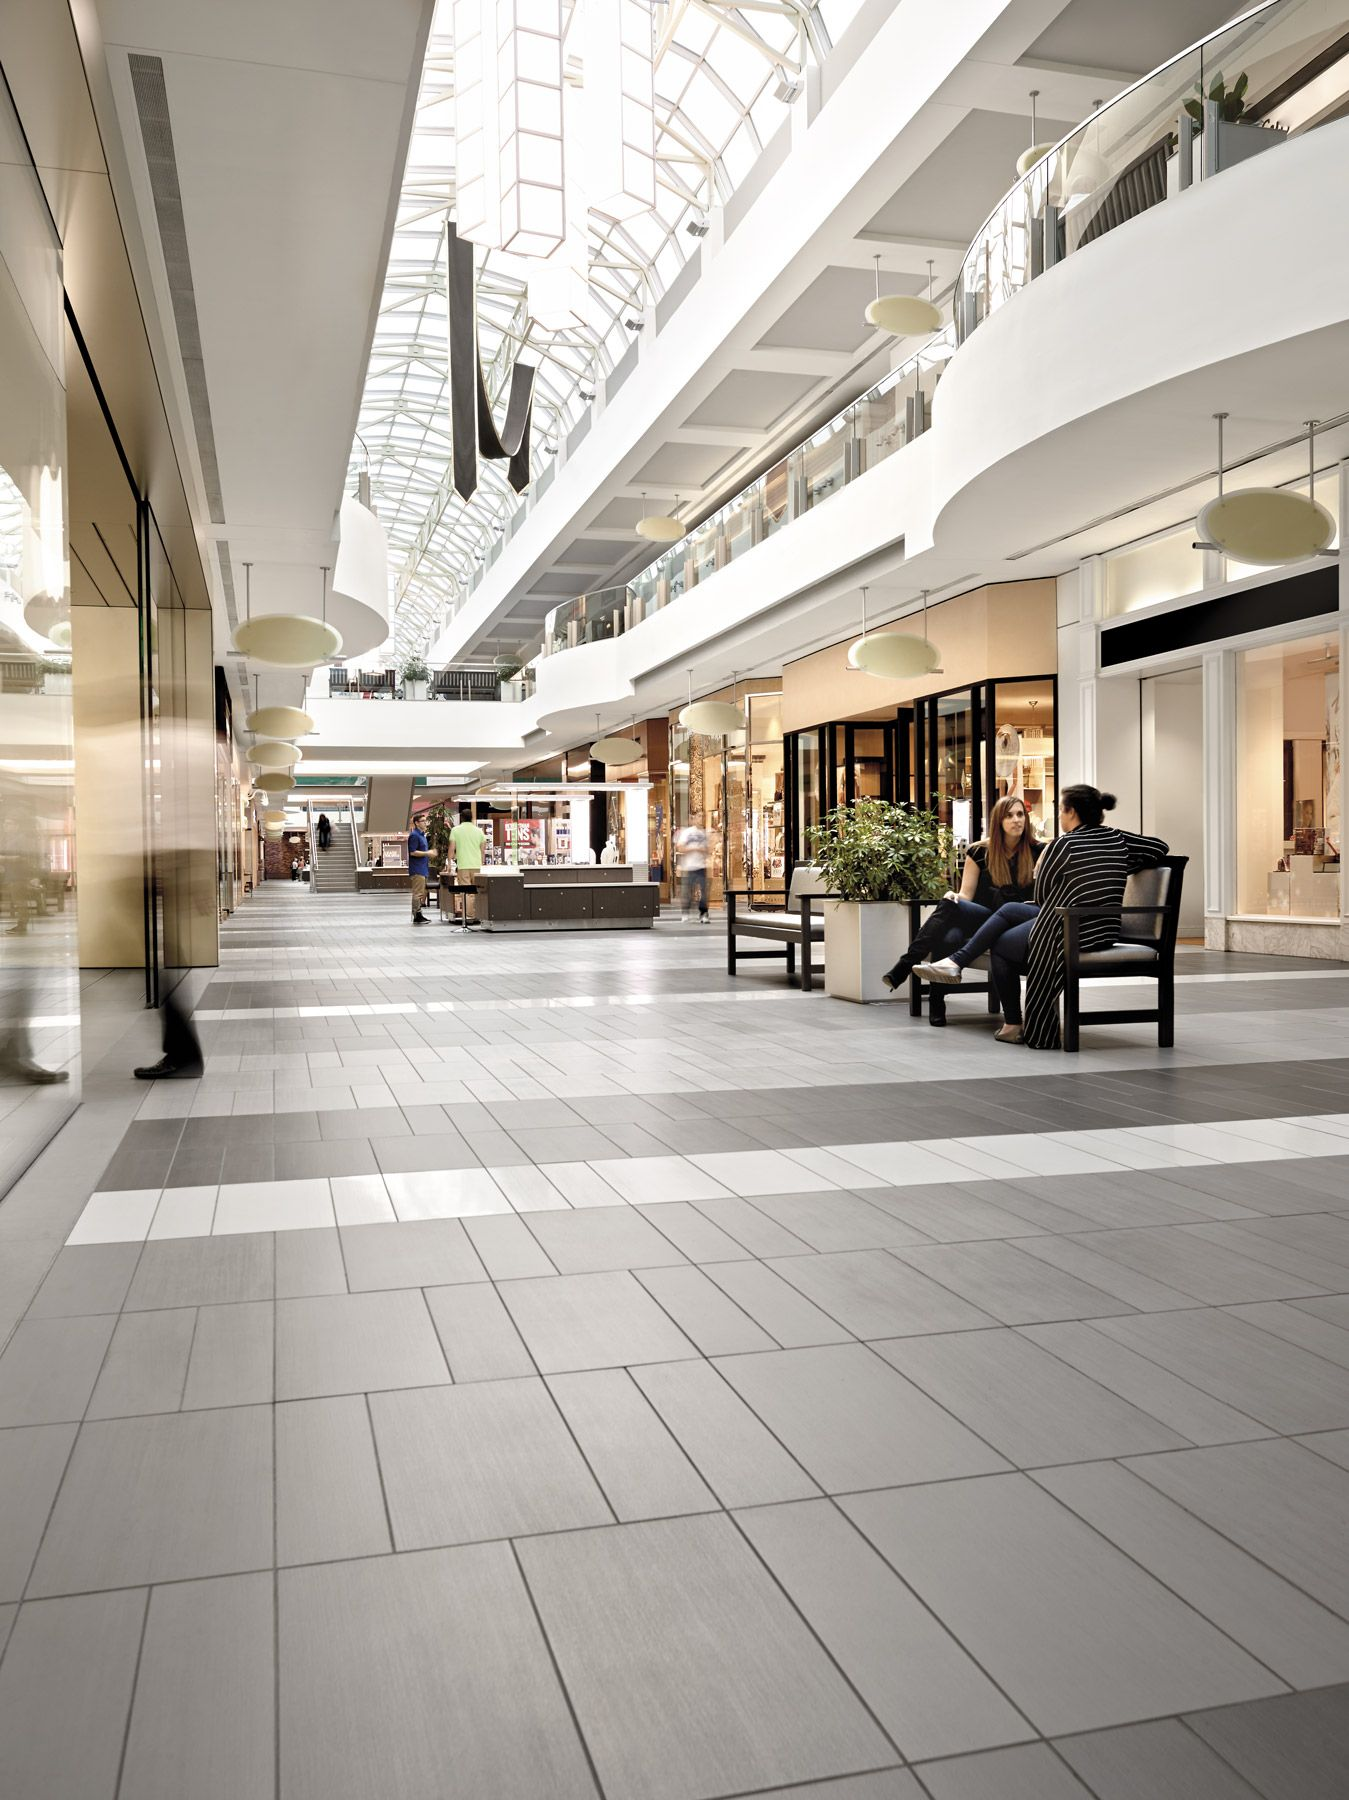 Coolsprings Galleria Shopping Mall Interior Mall Design Floor